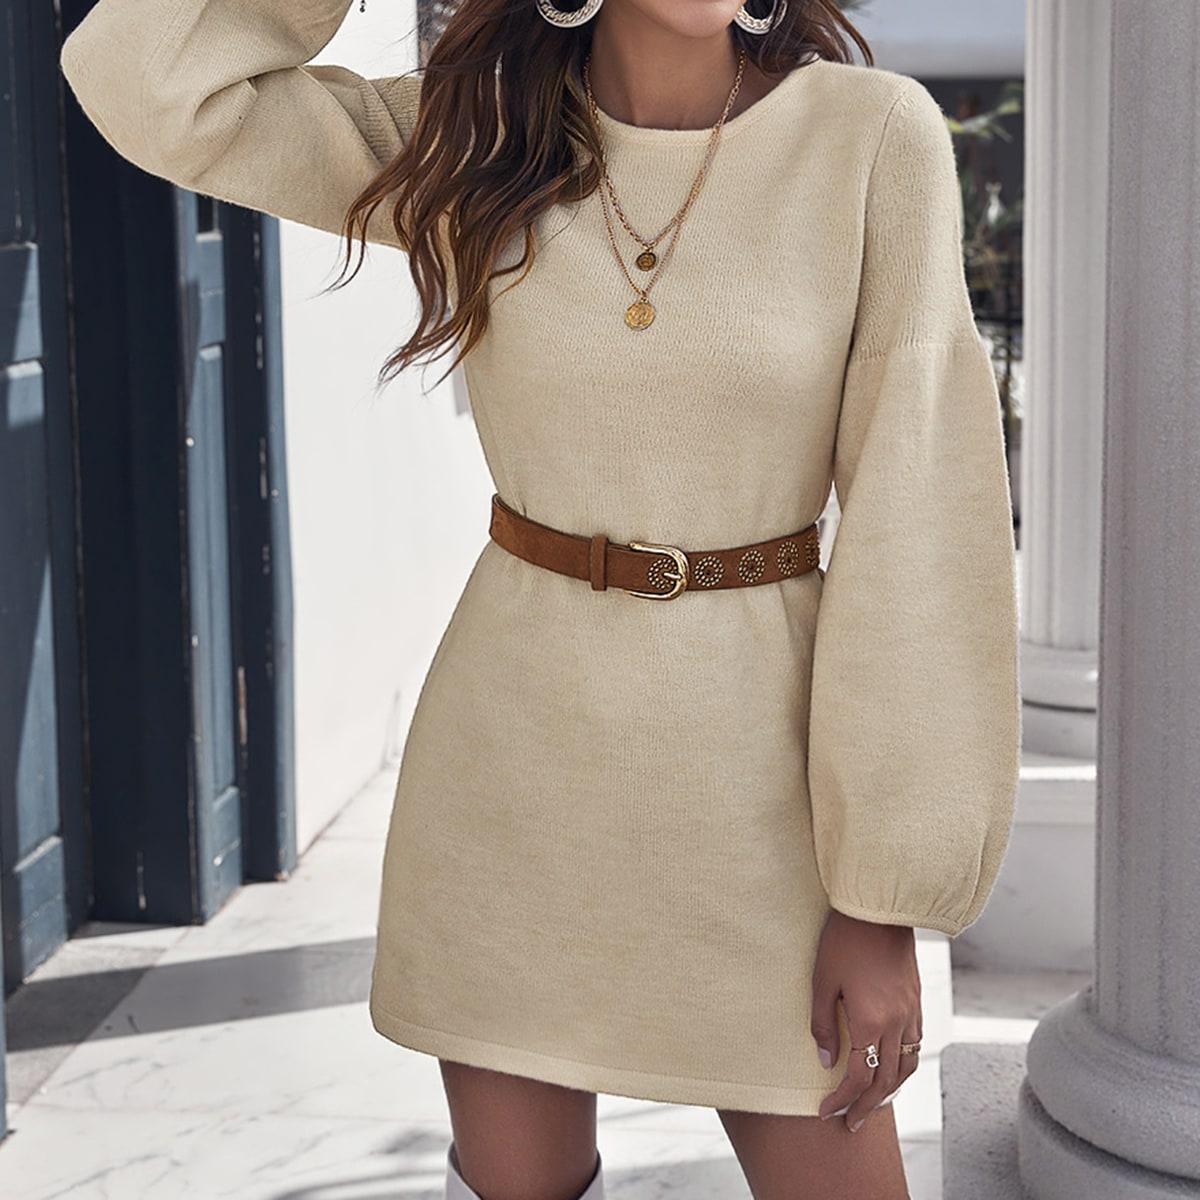 Drop Shoulder Lantern Sleeve Solid Sweater Dress Without Belt